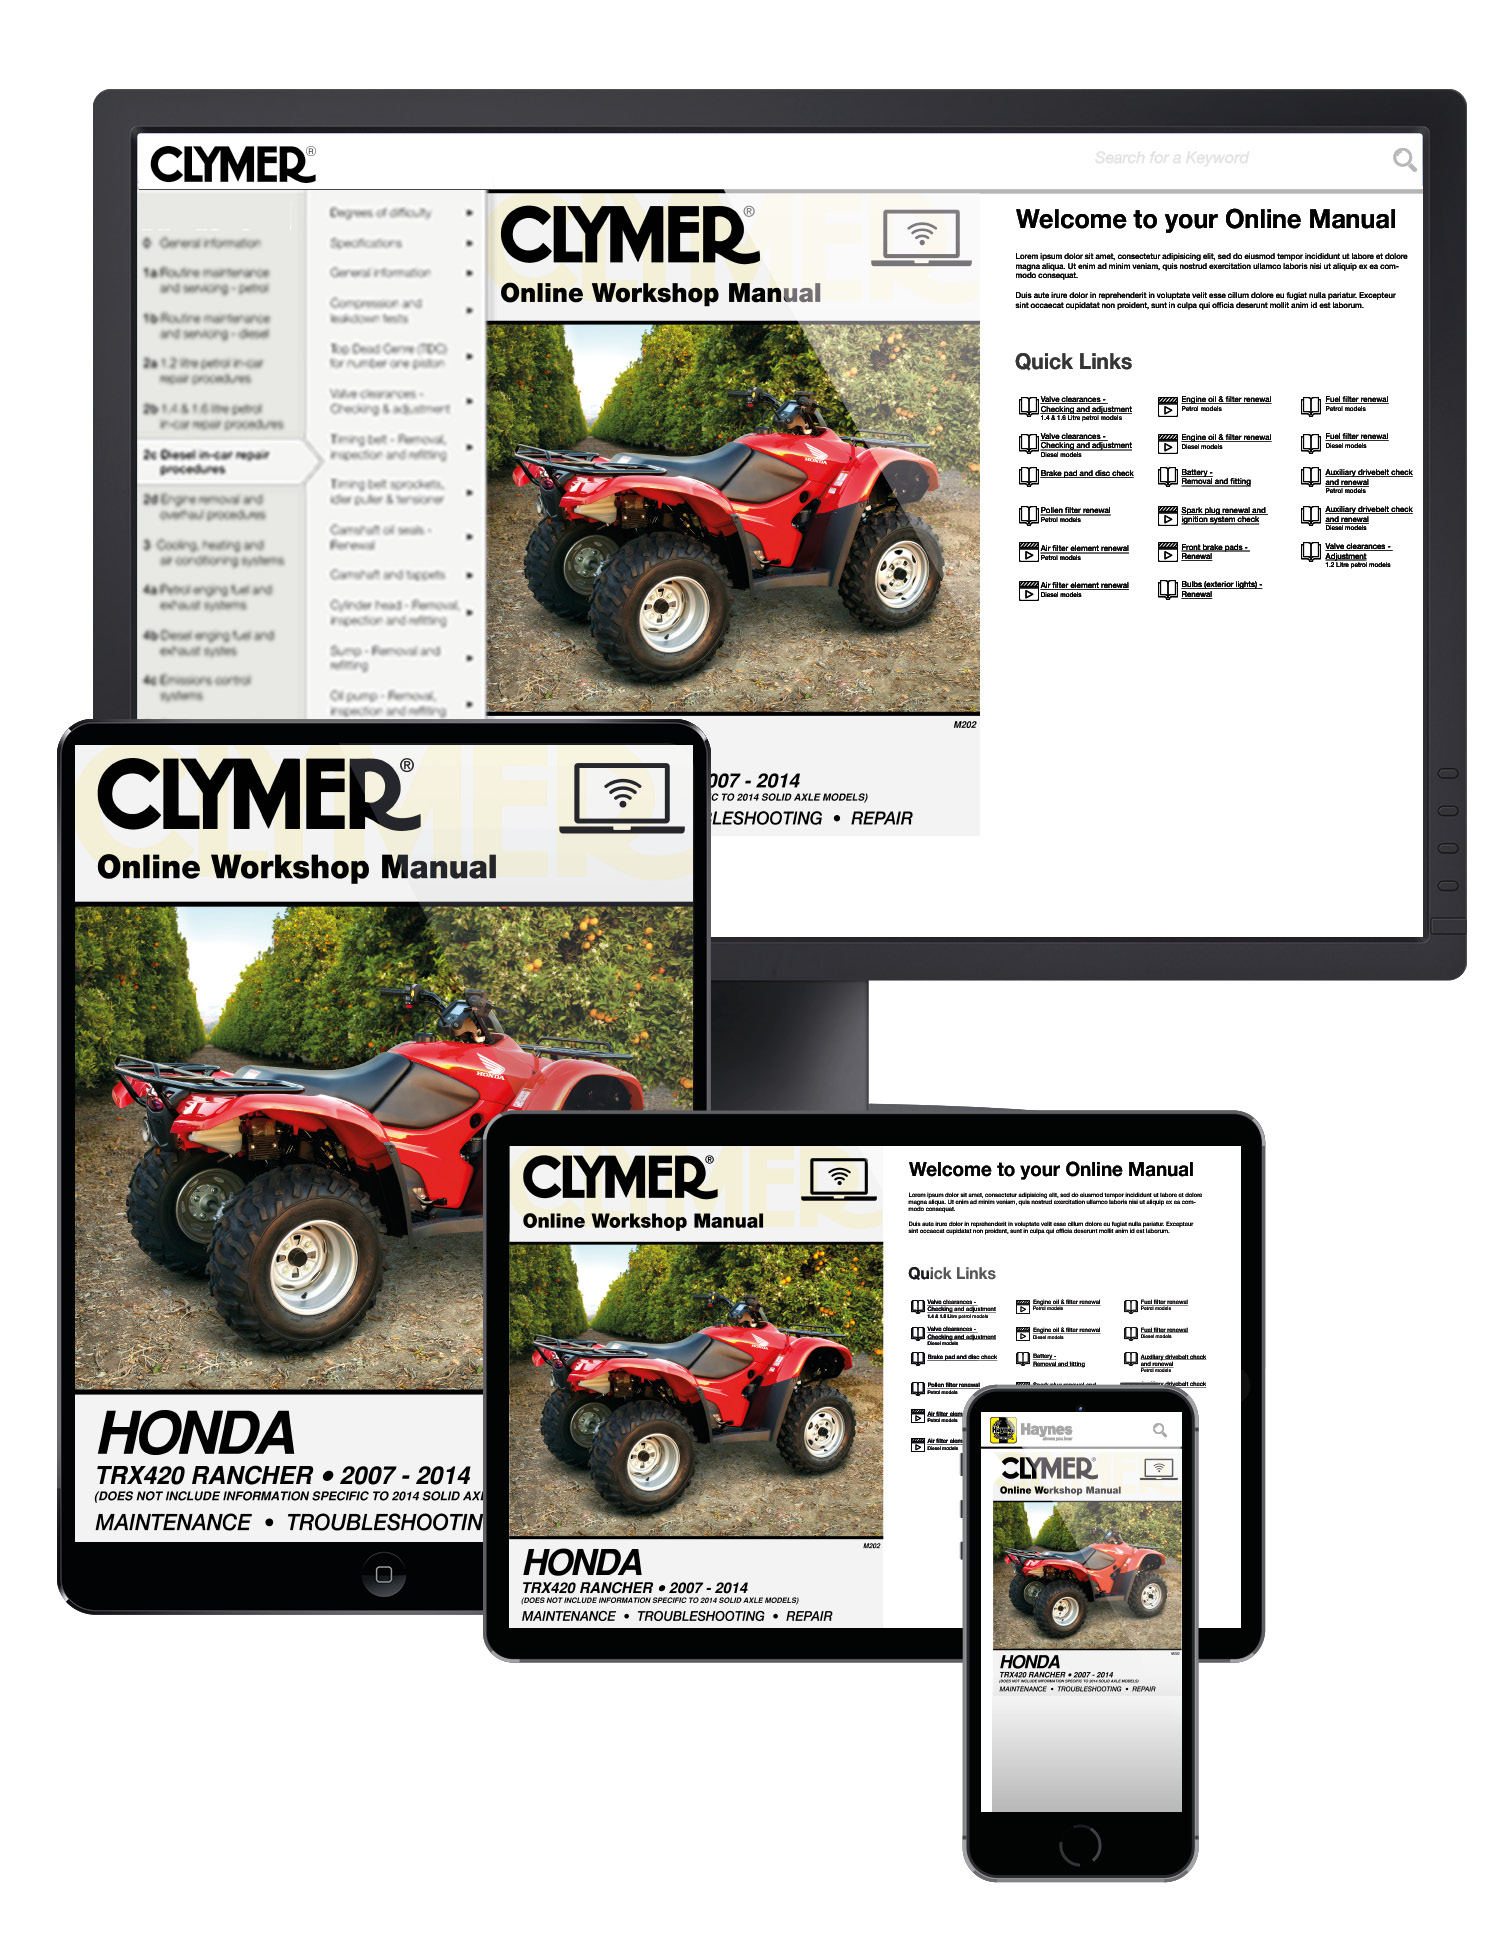 Honda TRX420 Rancher ATV (2007-2014) Service Repair Manual Online Manual